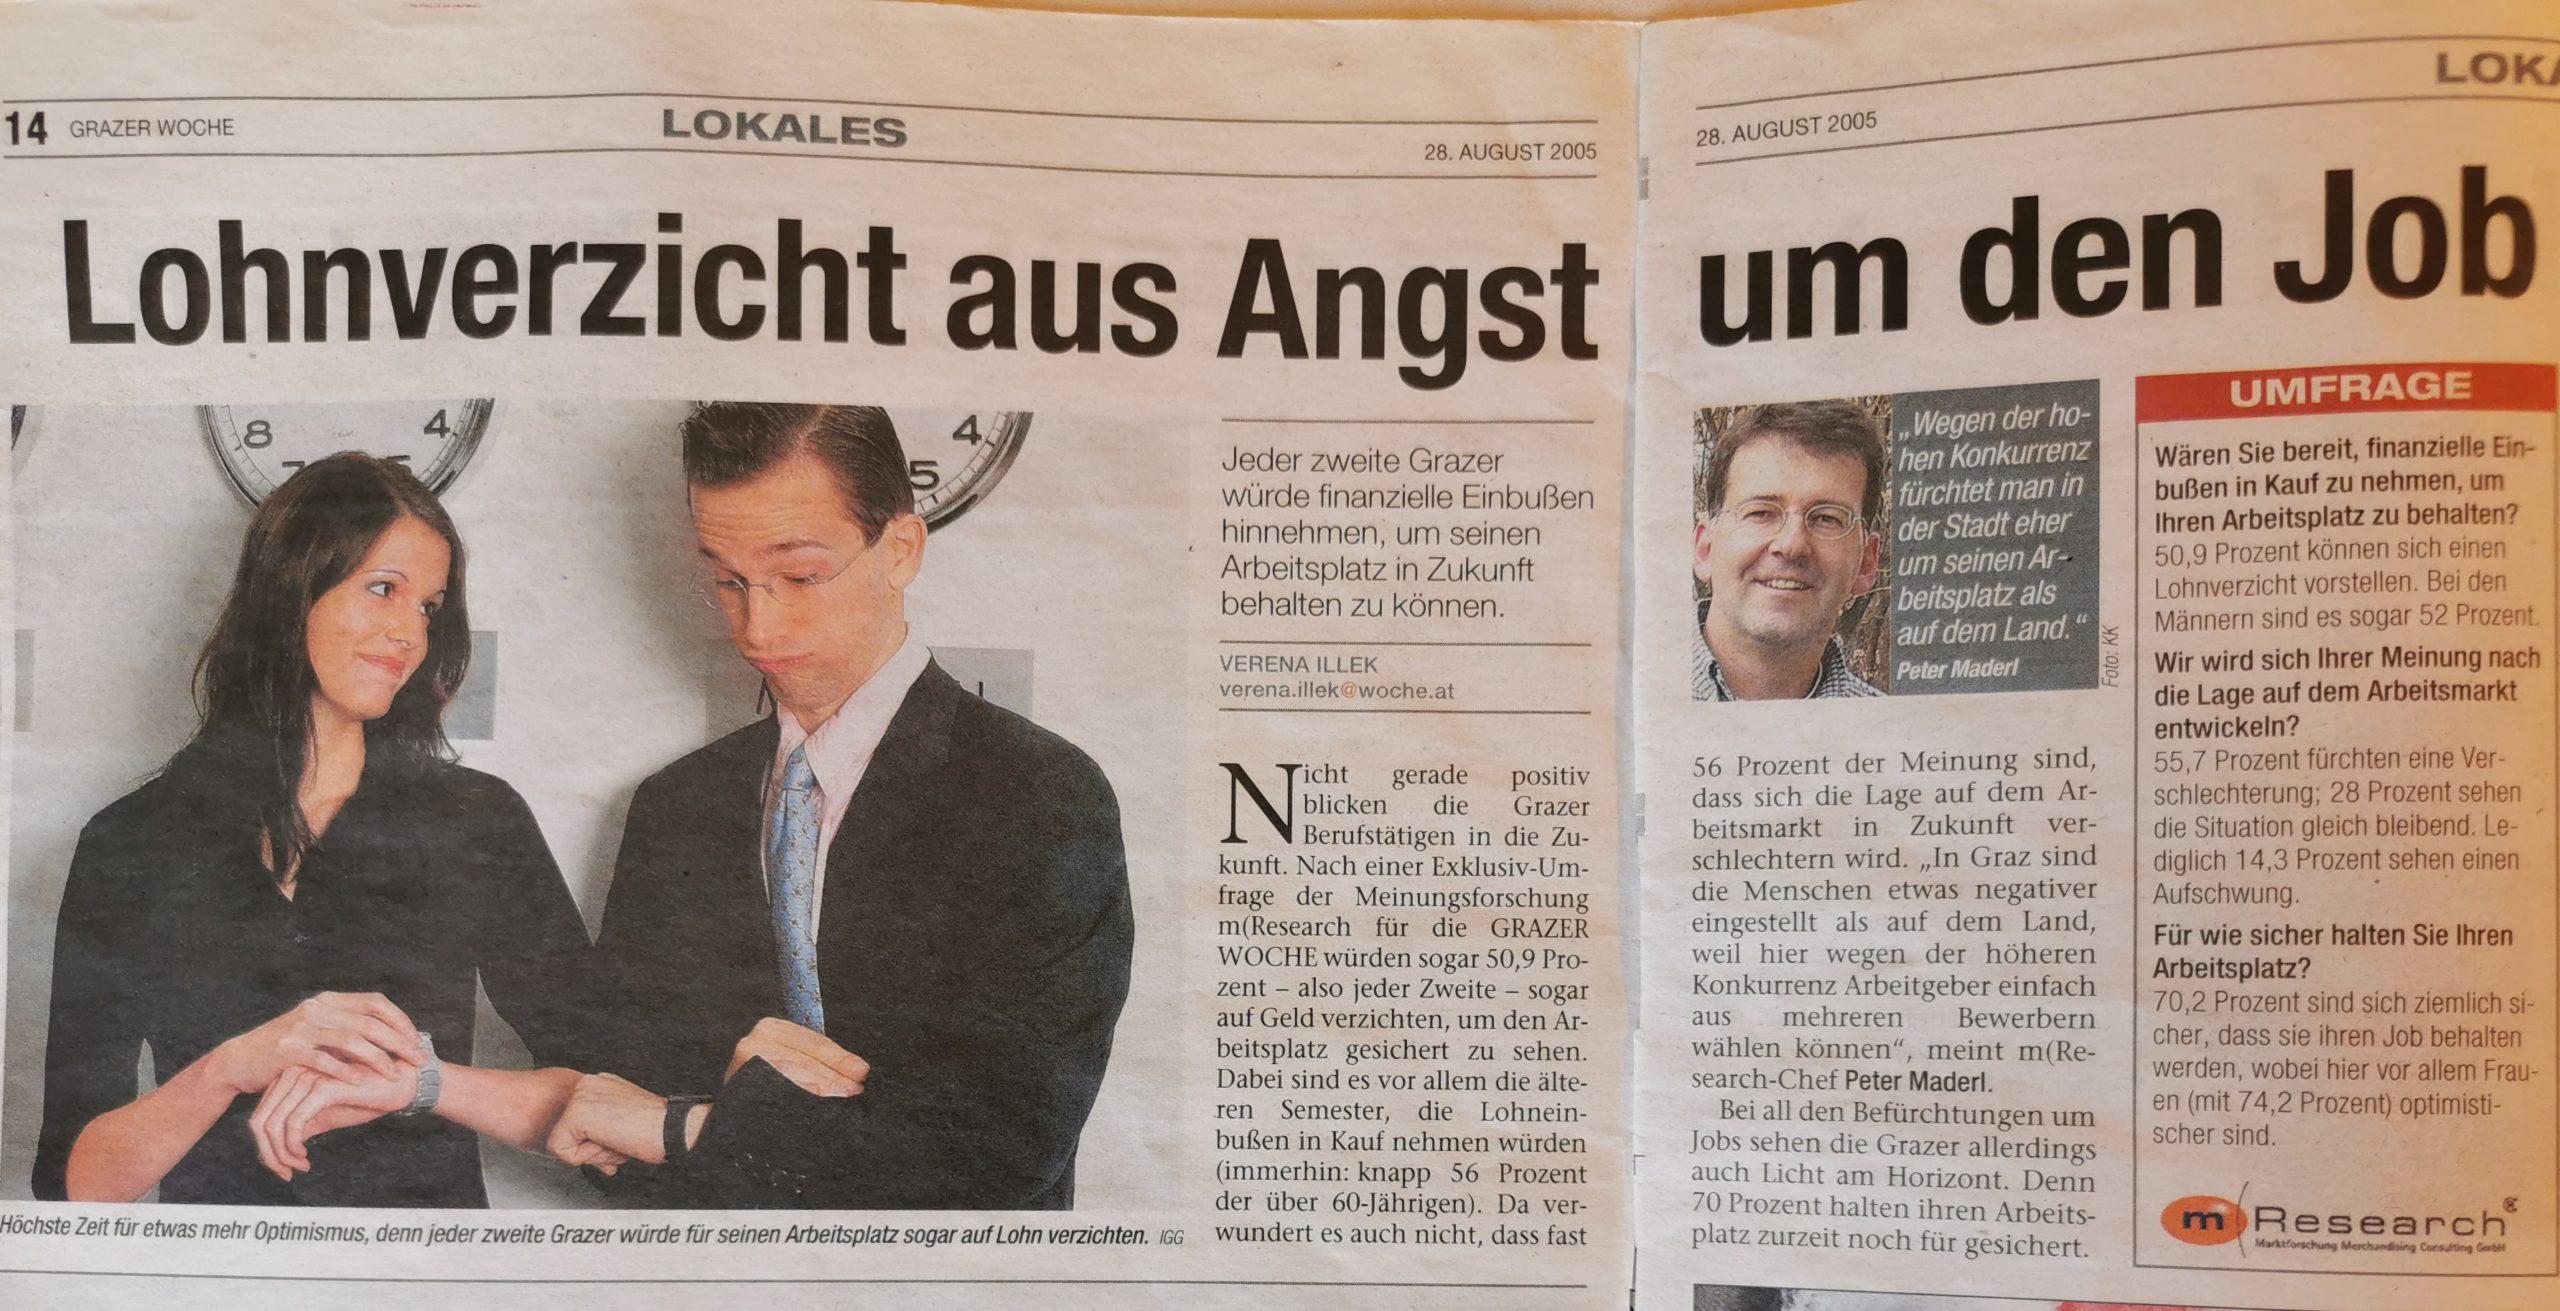 Lohnverzicht aus Angst um Job Umfrage Graz